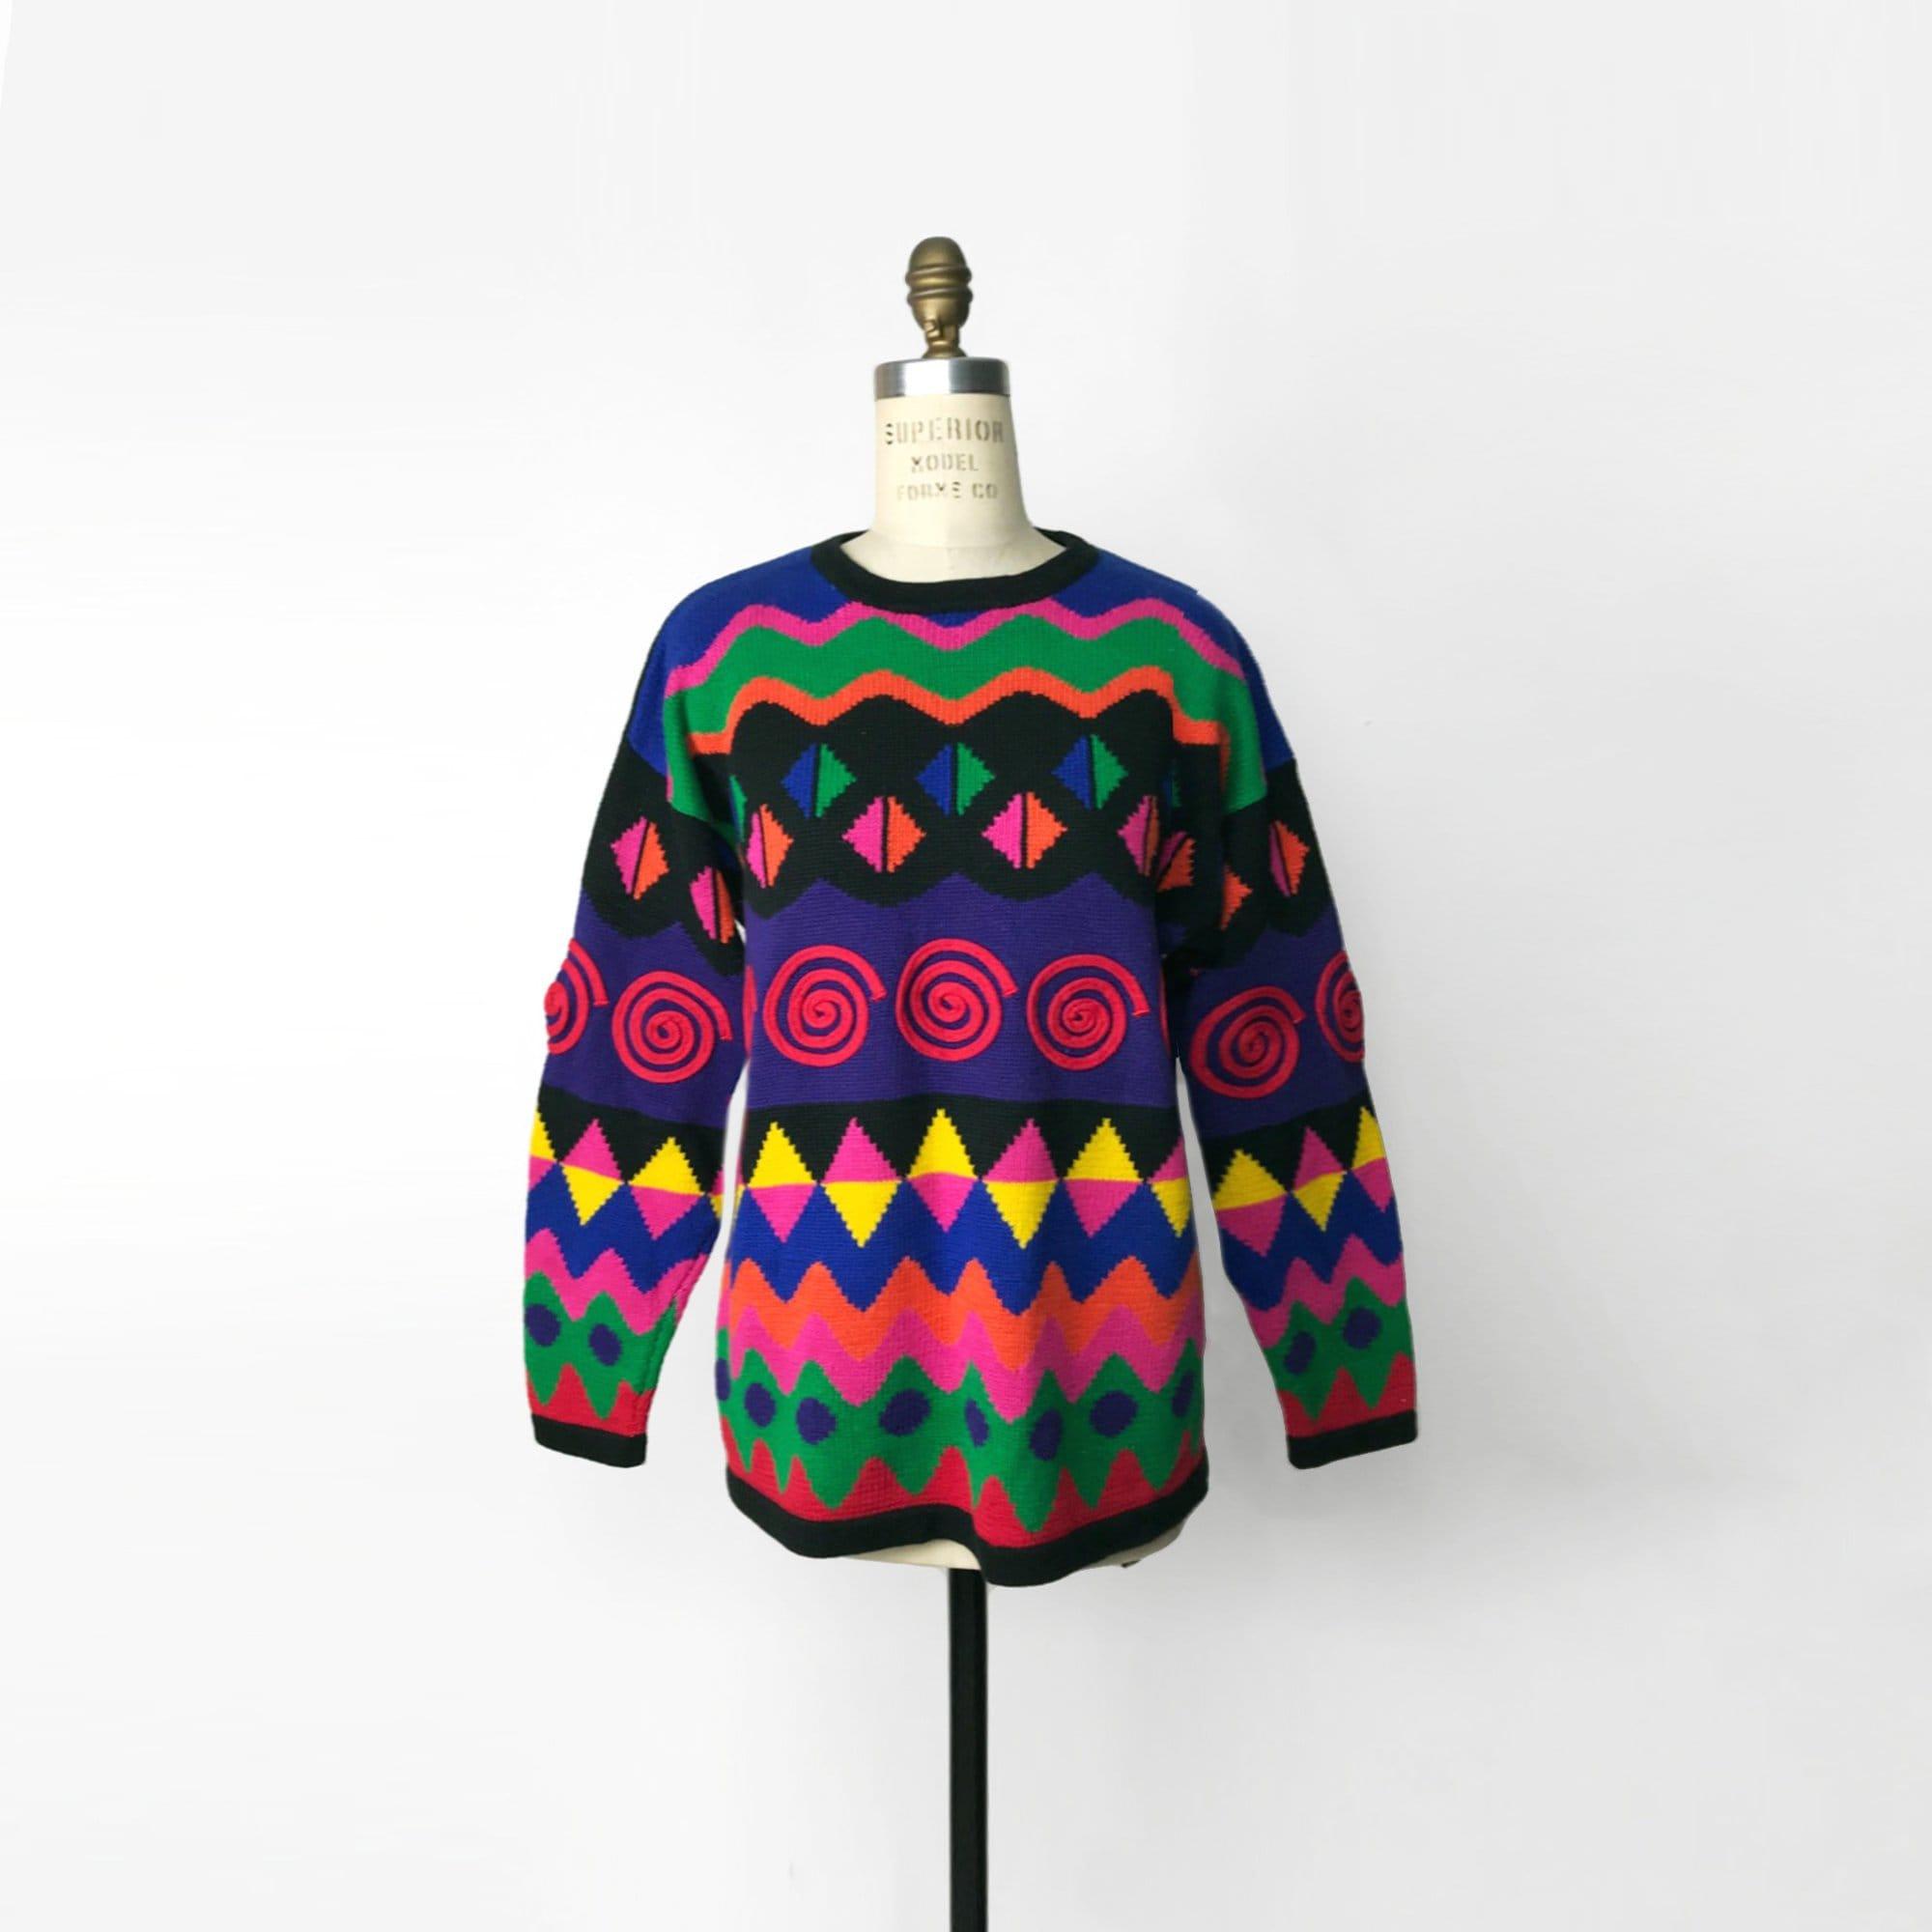 42859adfb6c2 90s colorful swirl sweater